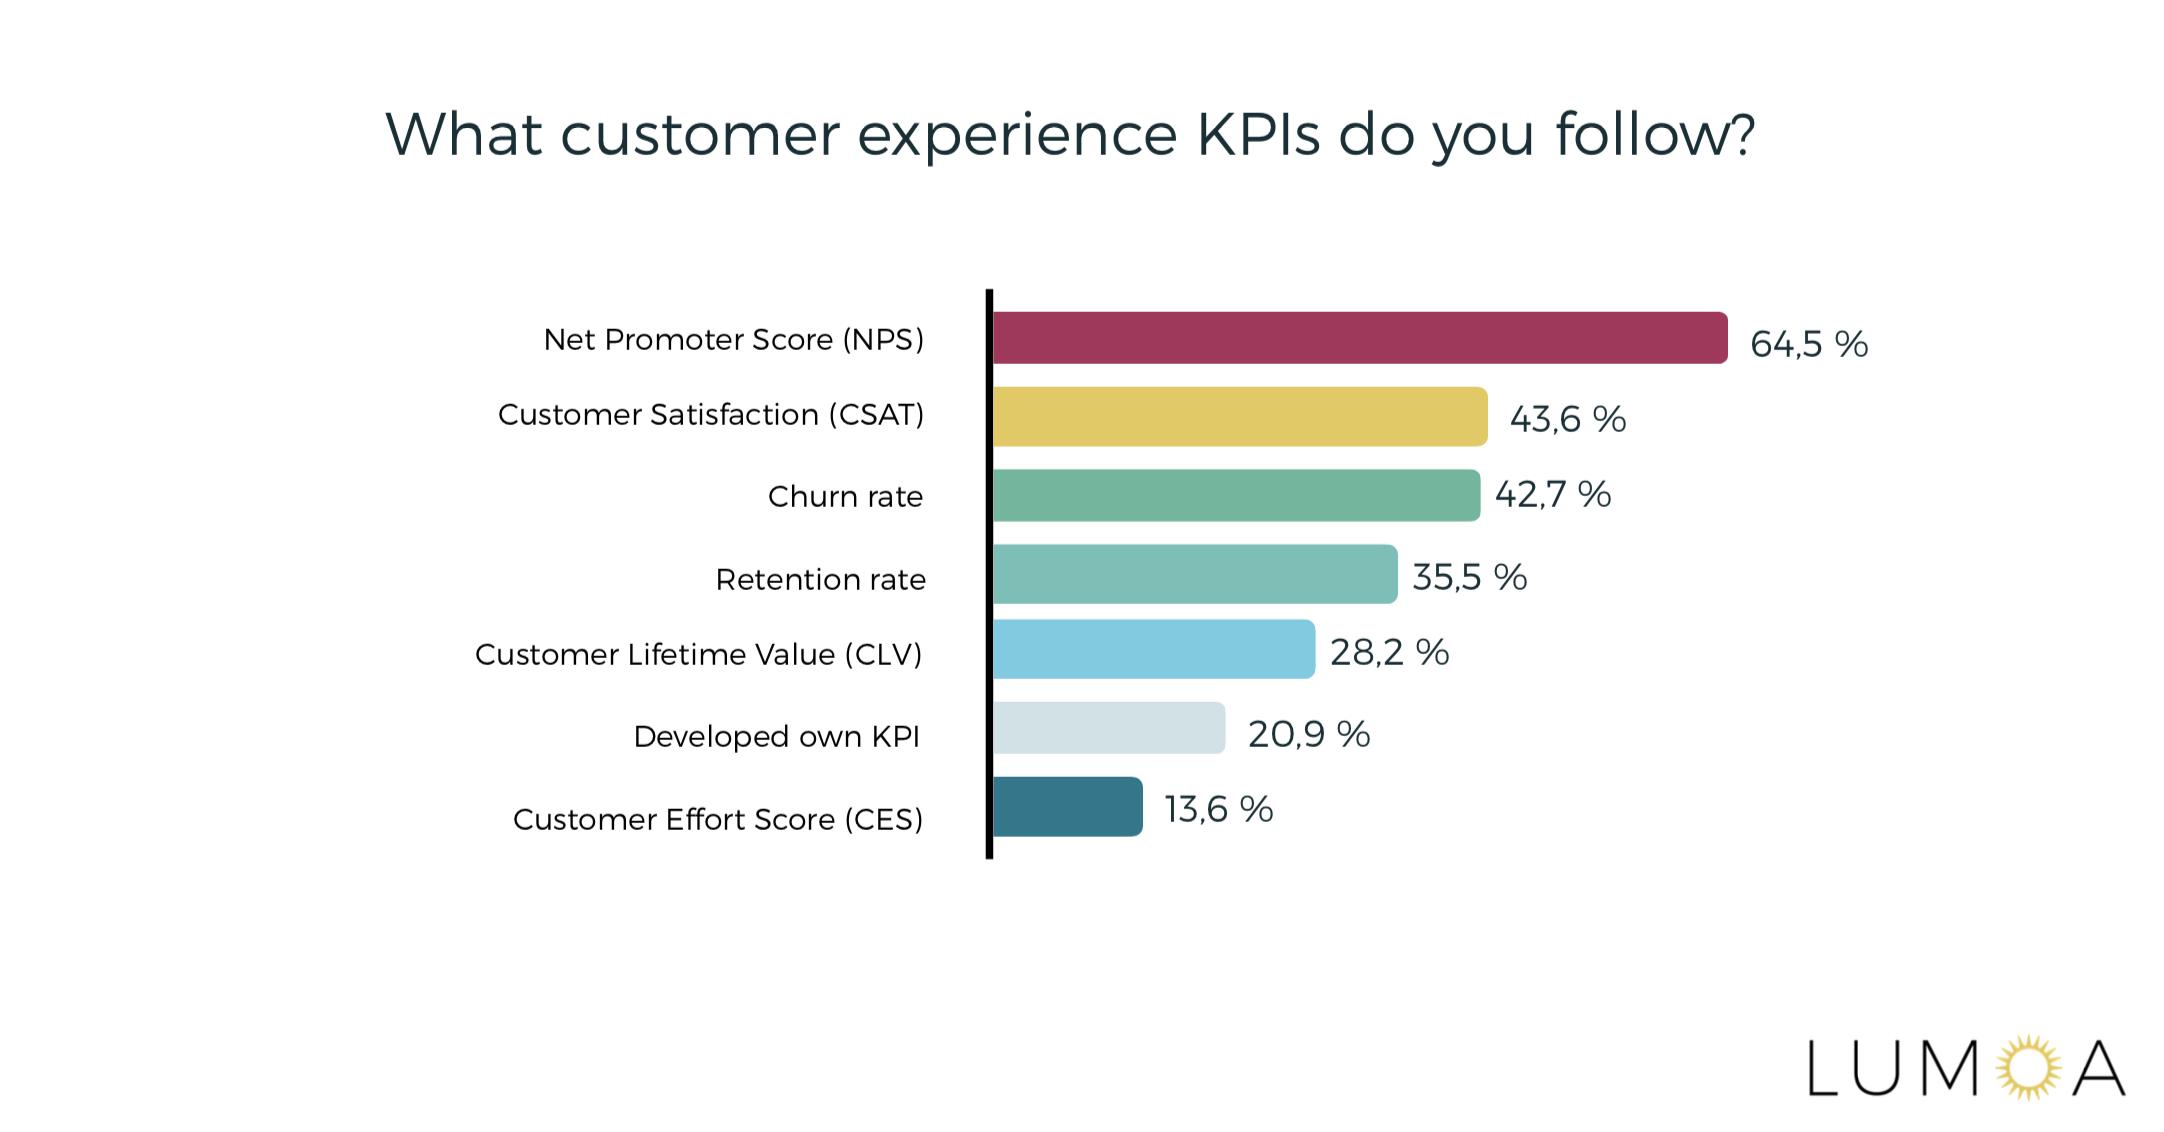 Customer Experience KPIs Statistics